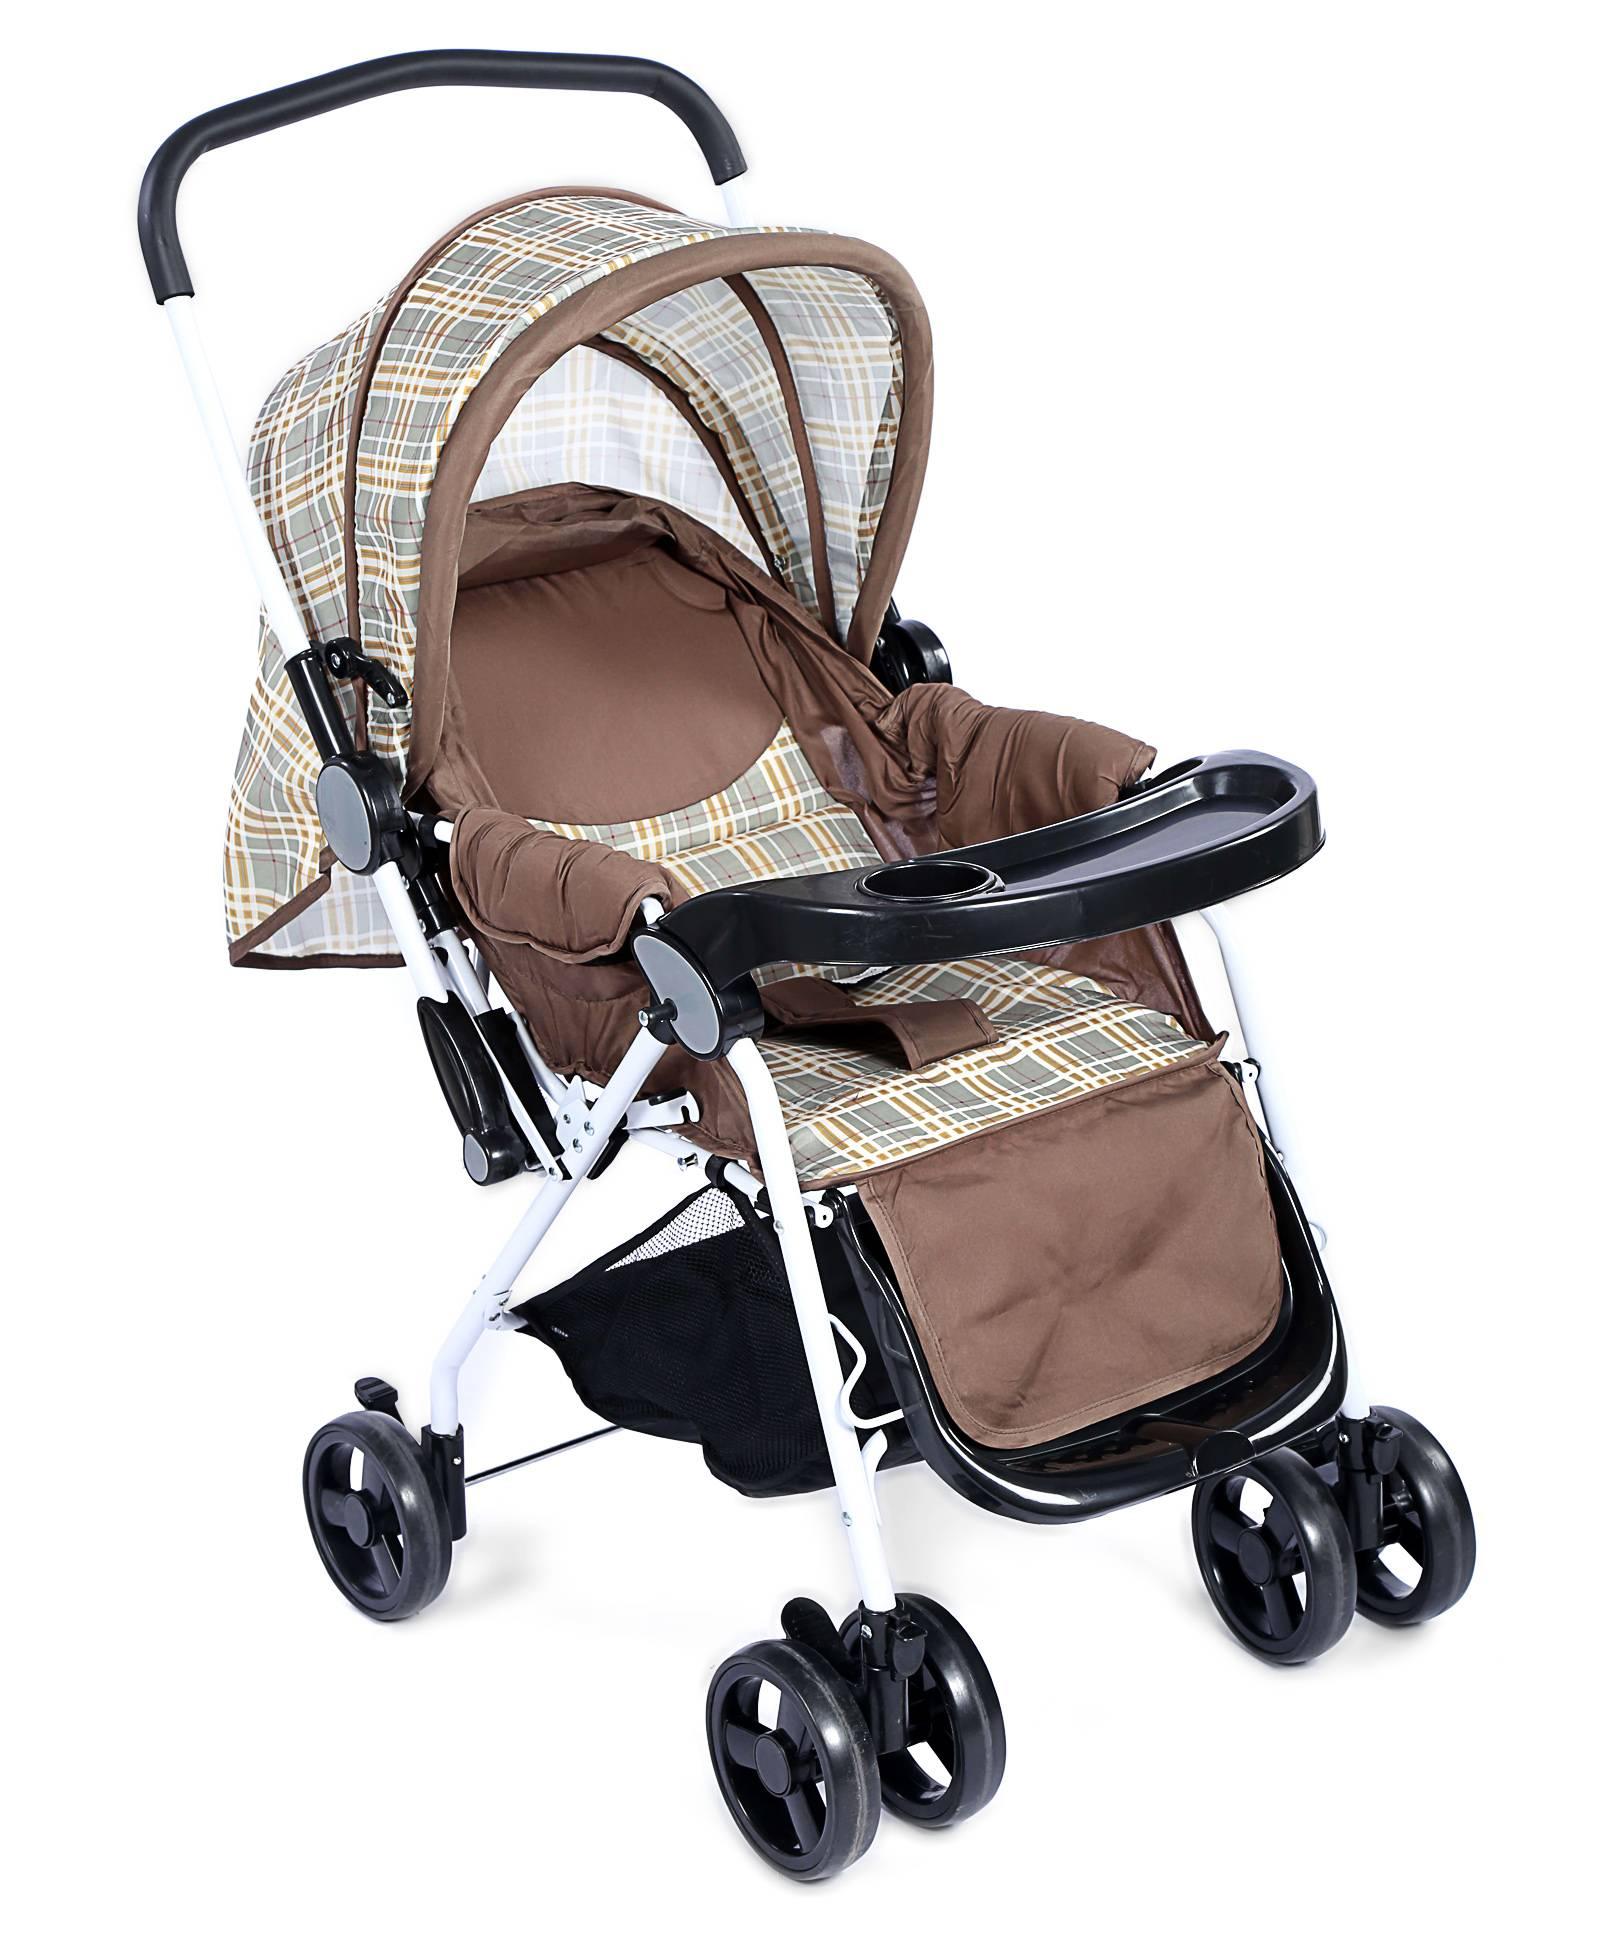 Baby Pram Cum Stroller Checks Print - Brown And Black